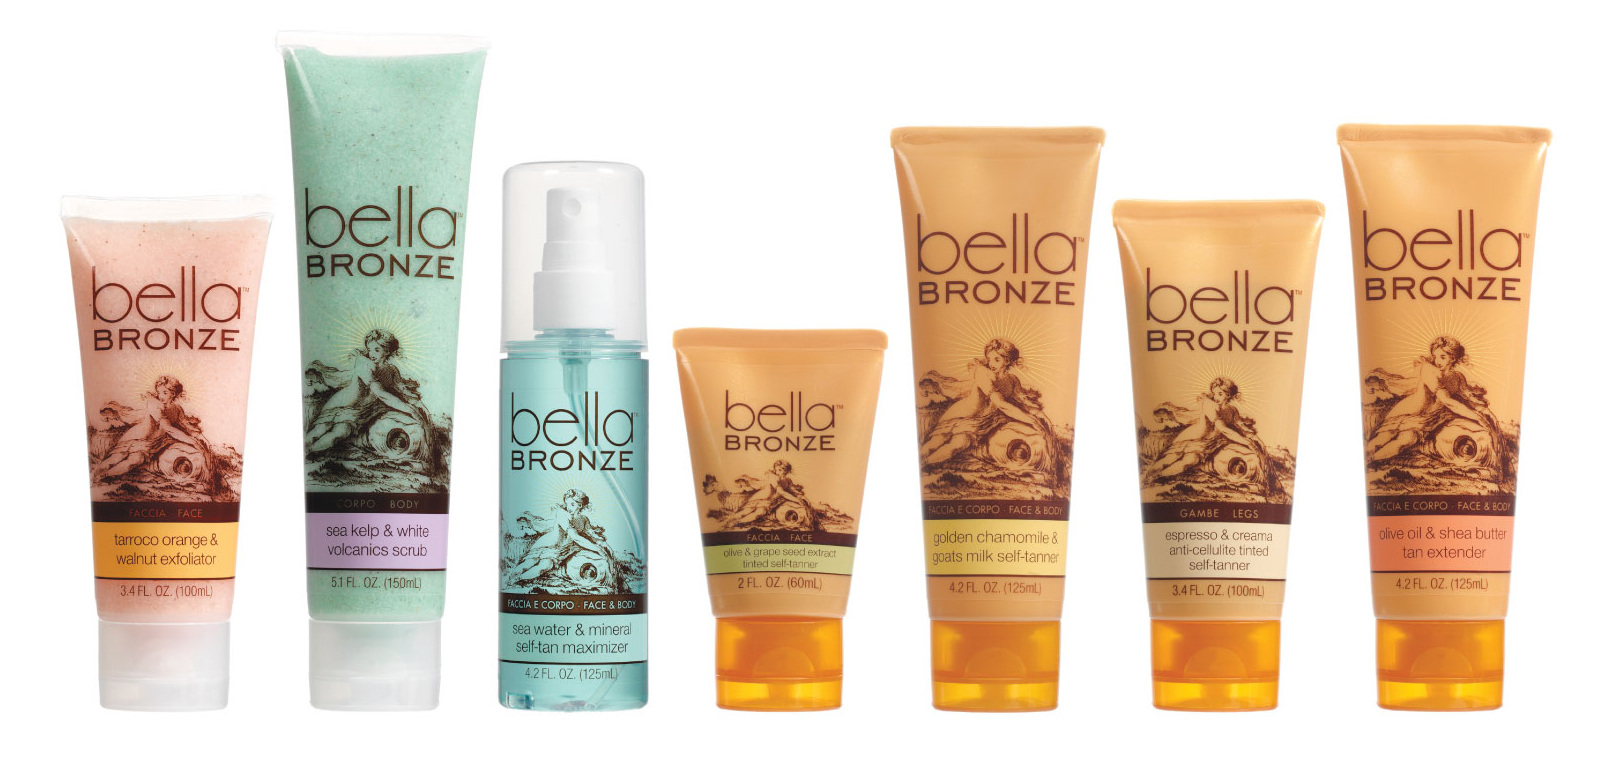 Bella Bronze Package Design - Final